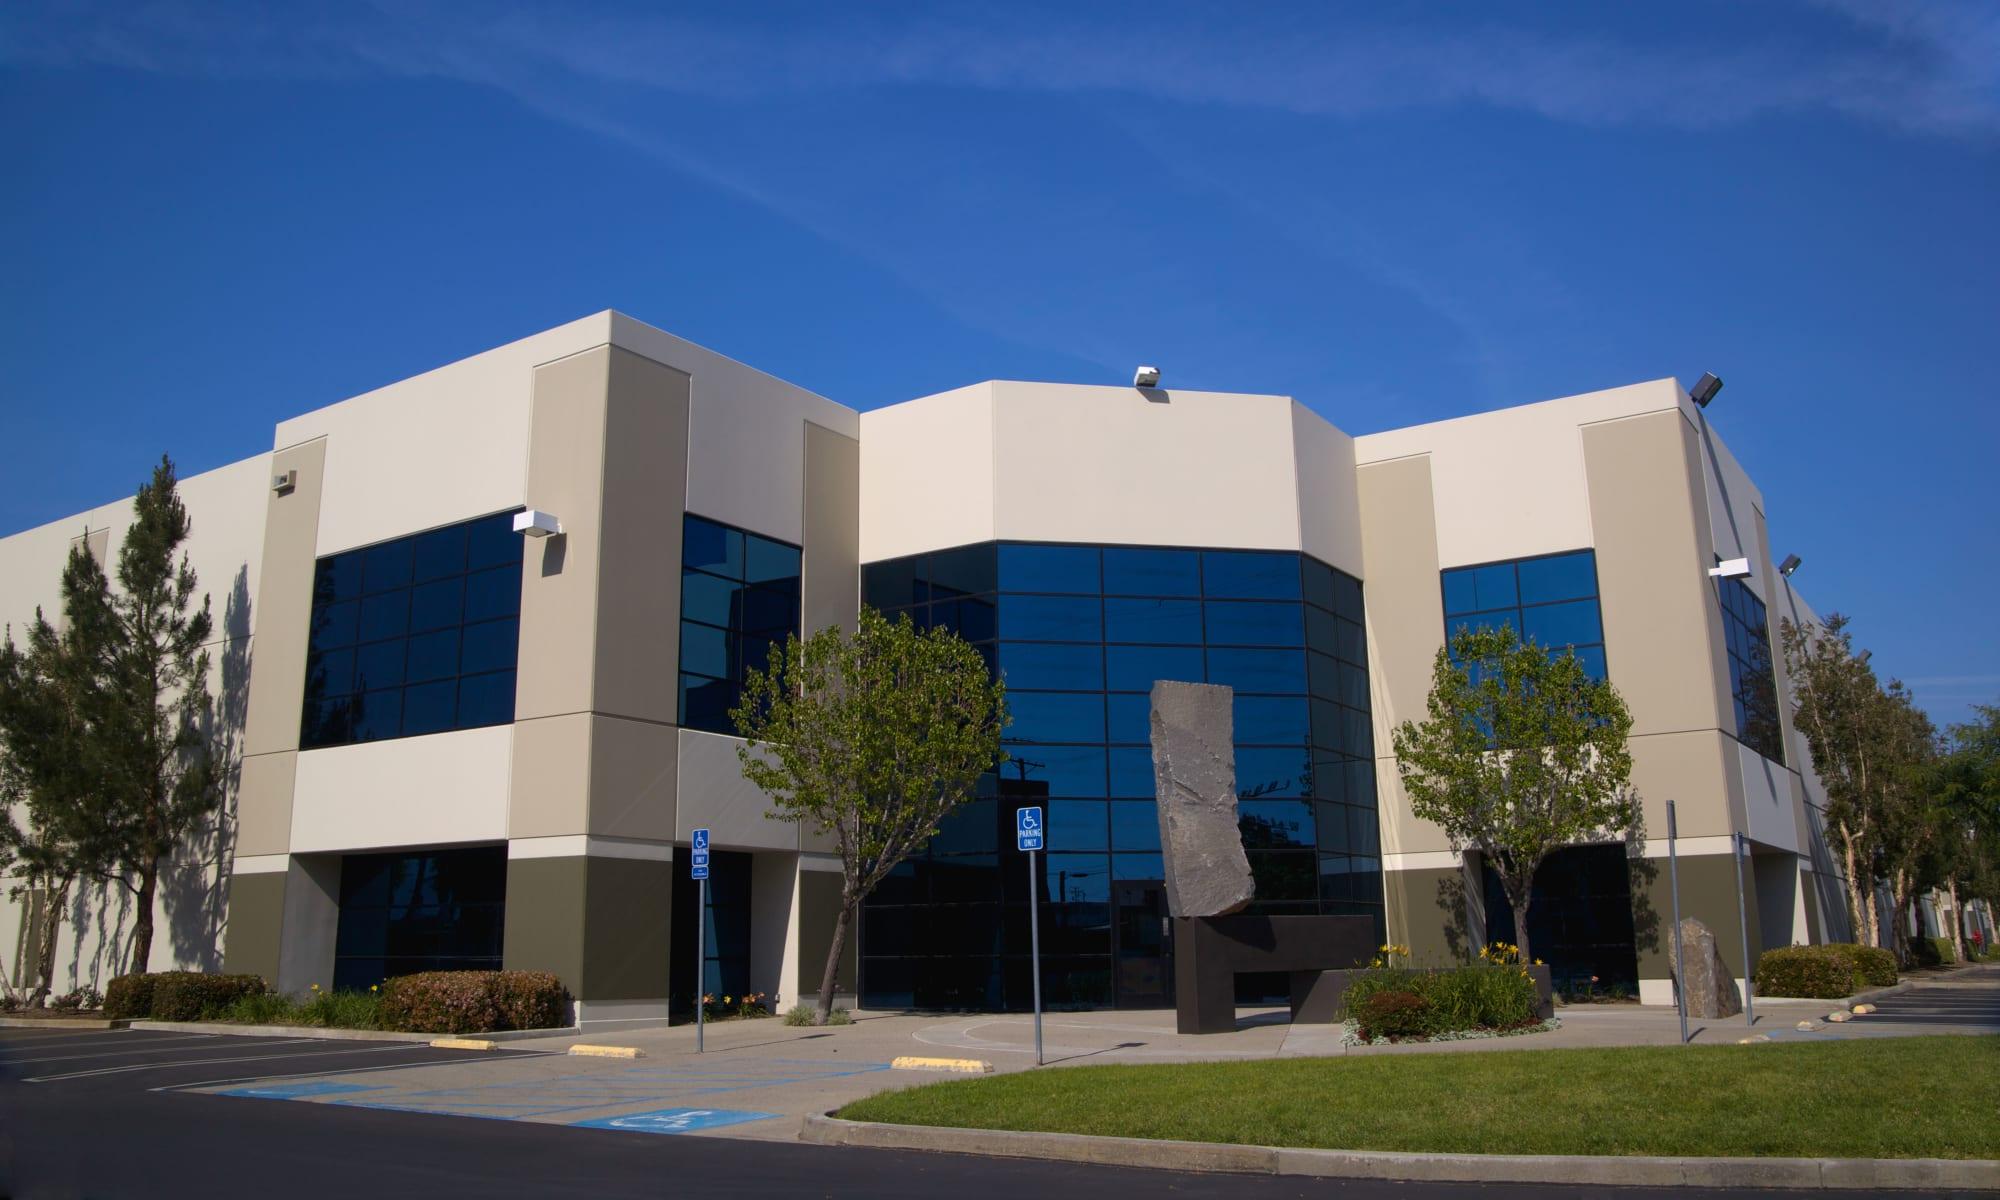 Arrow Business Center apartments in Rancho Cucamonga, California